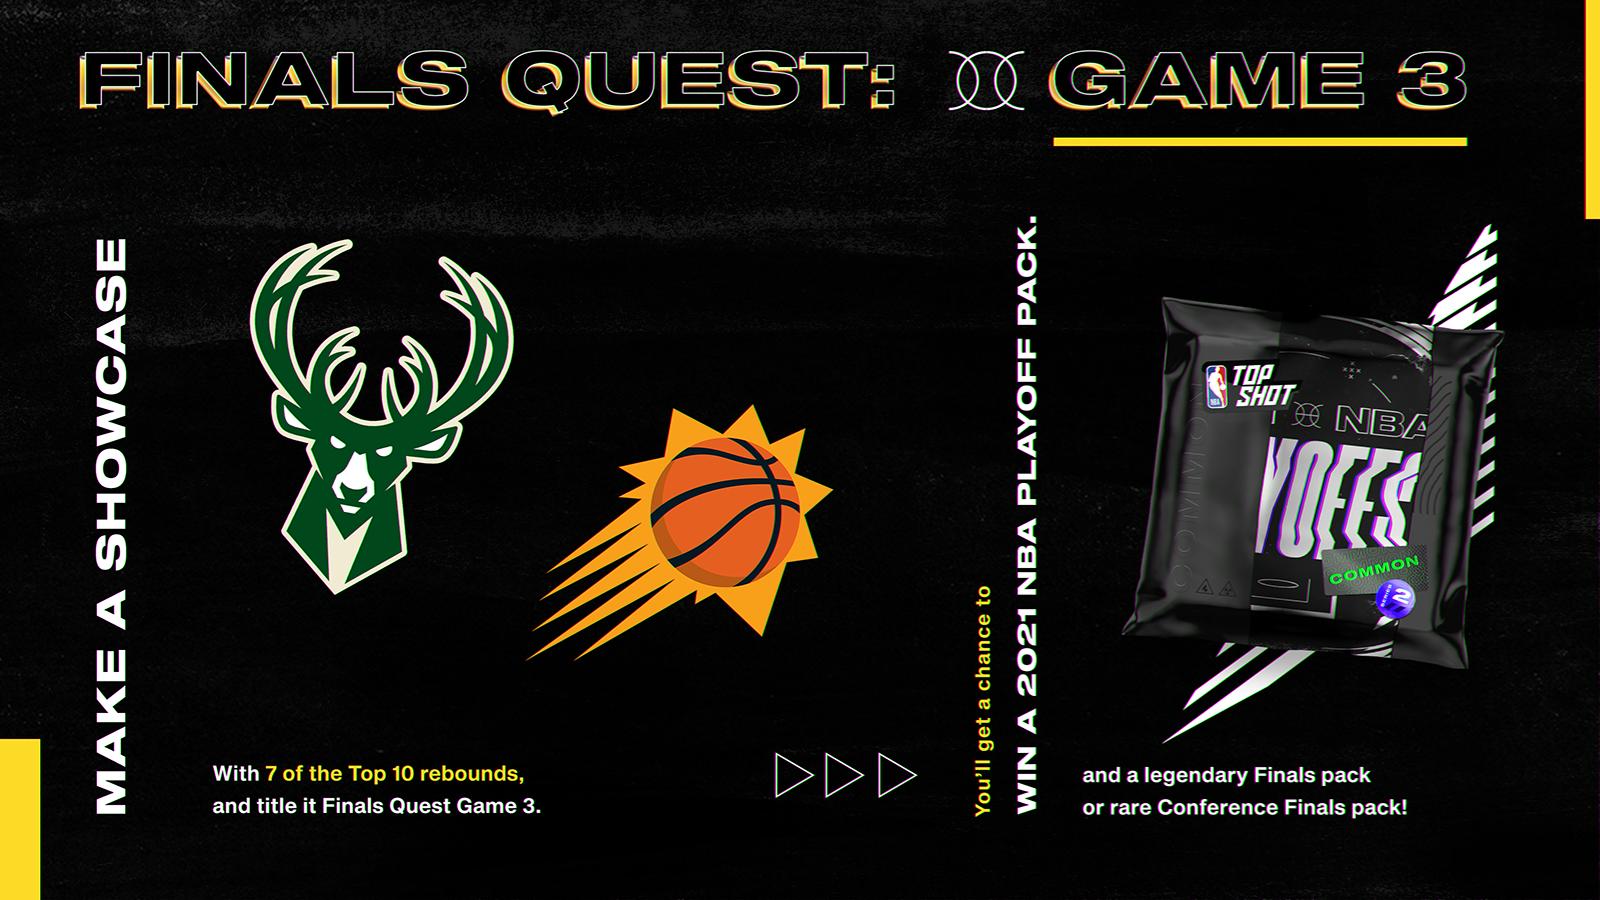 Game 3: Can the Bucks rebound down 2-0?